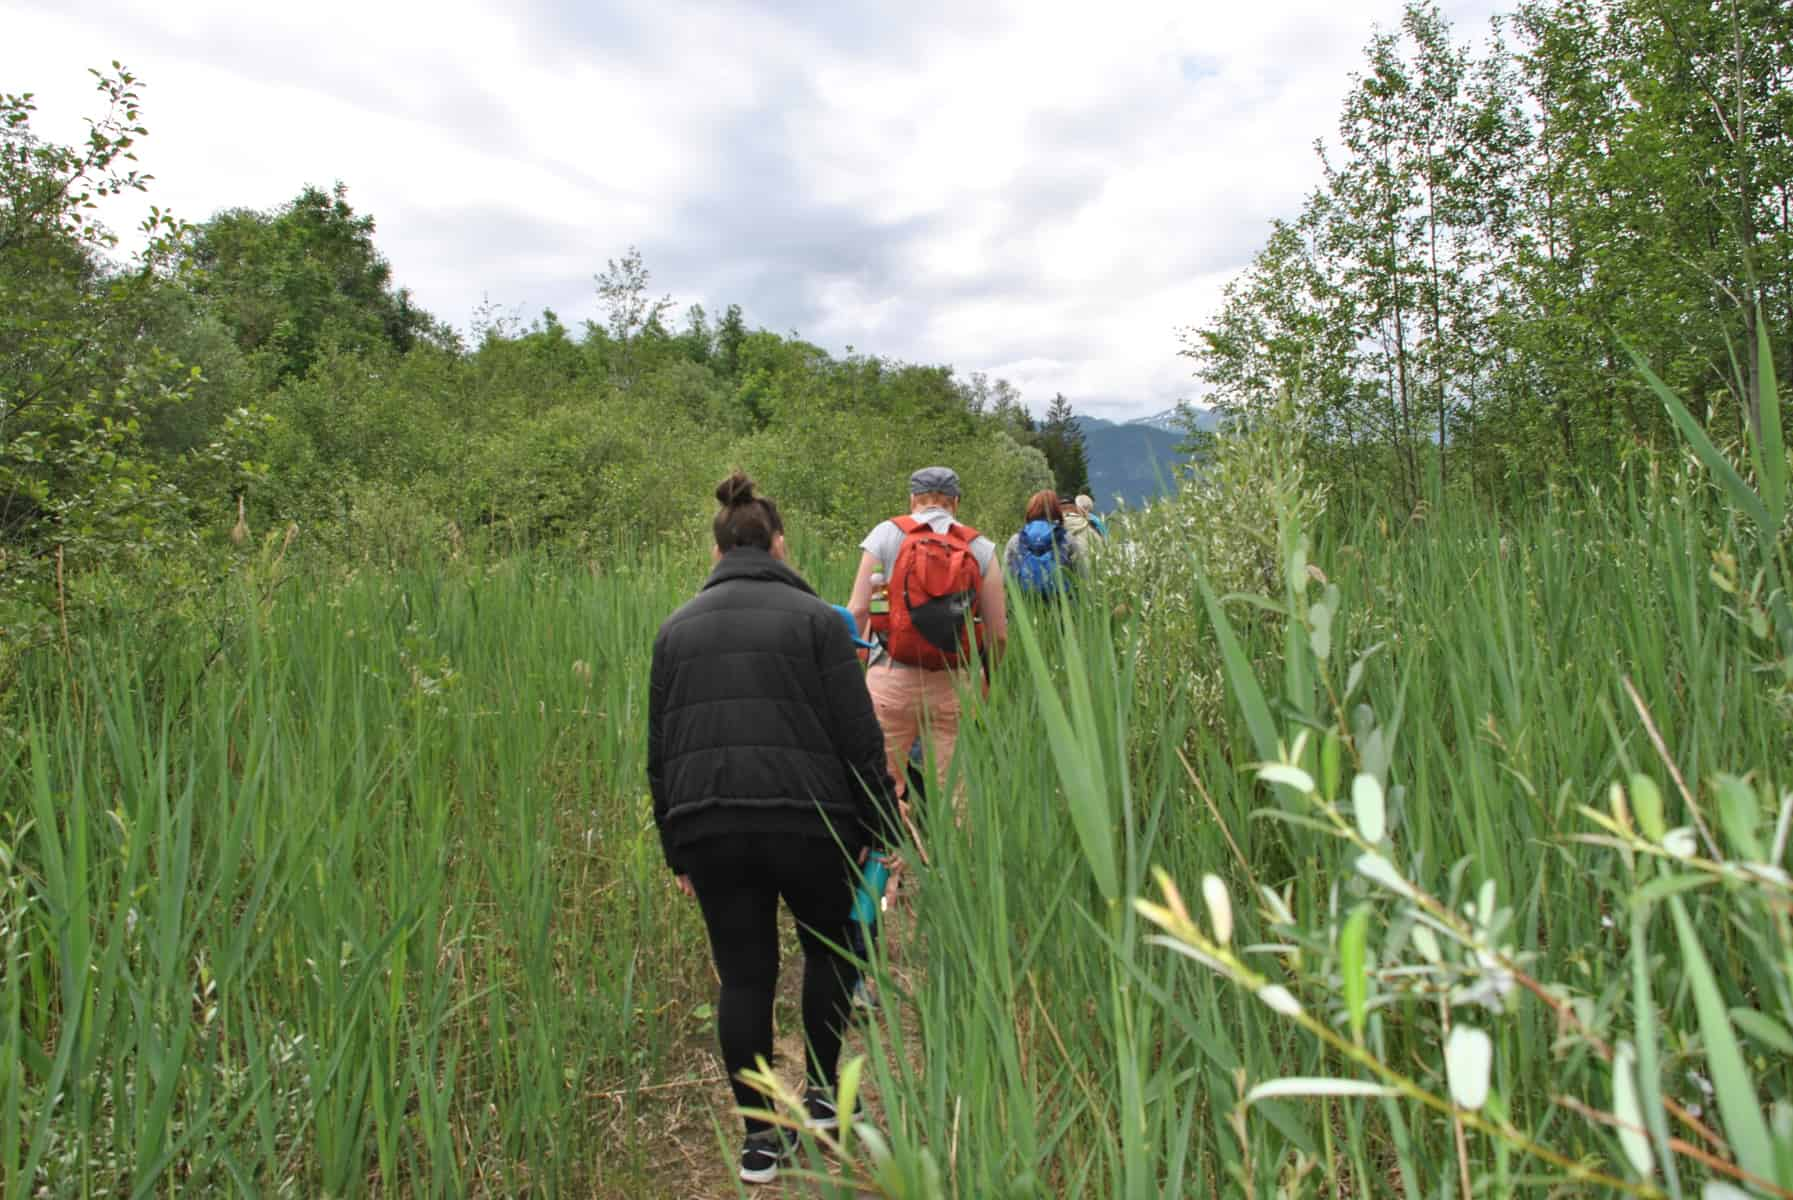 Lebendiger Lebensraum - Im Naturpark Tiroler Lech zur Auwald-Safari 9